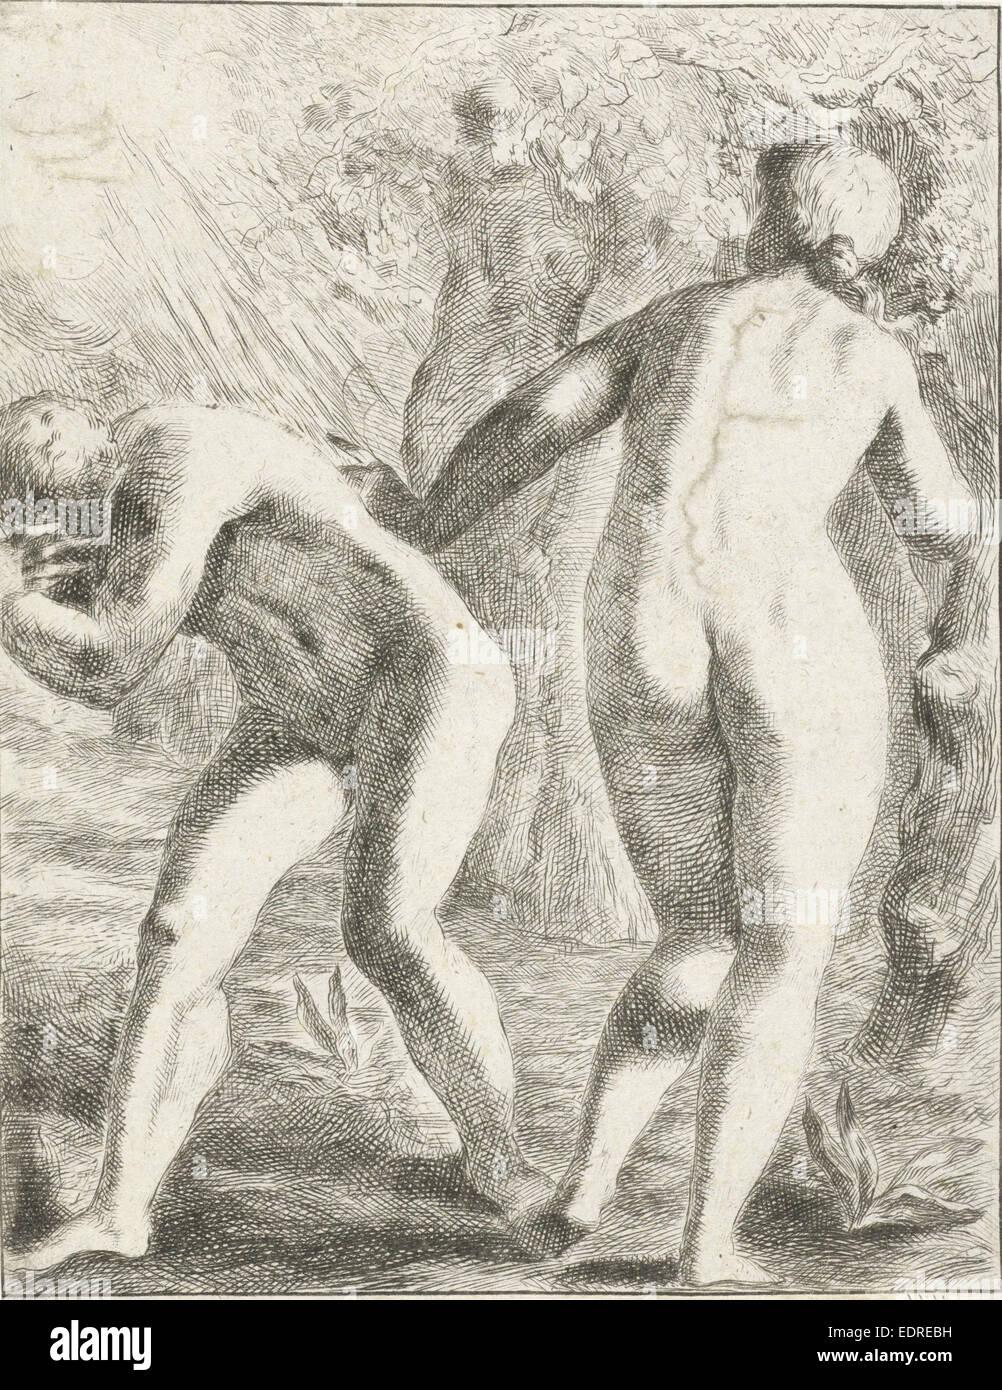 Expulsion from Paradise, Pieter van der Plas (II), 1687 - 1708 - Stock Image